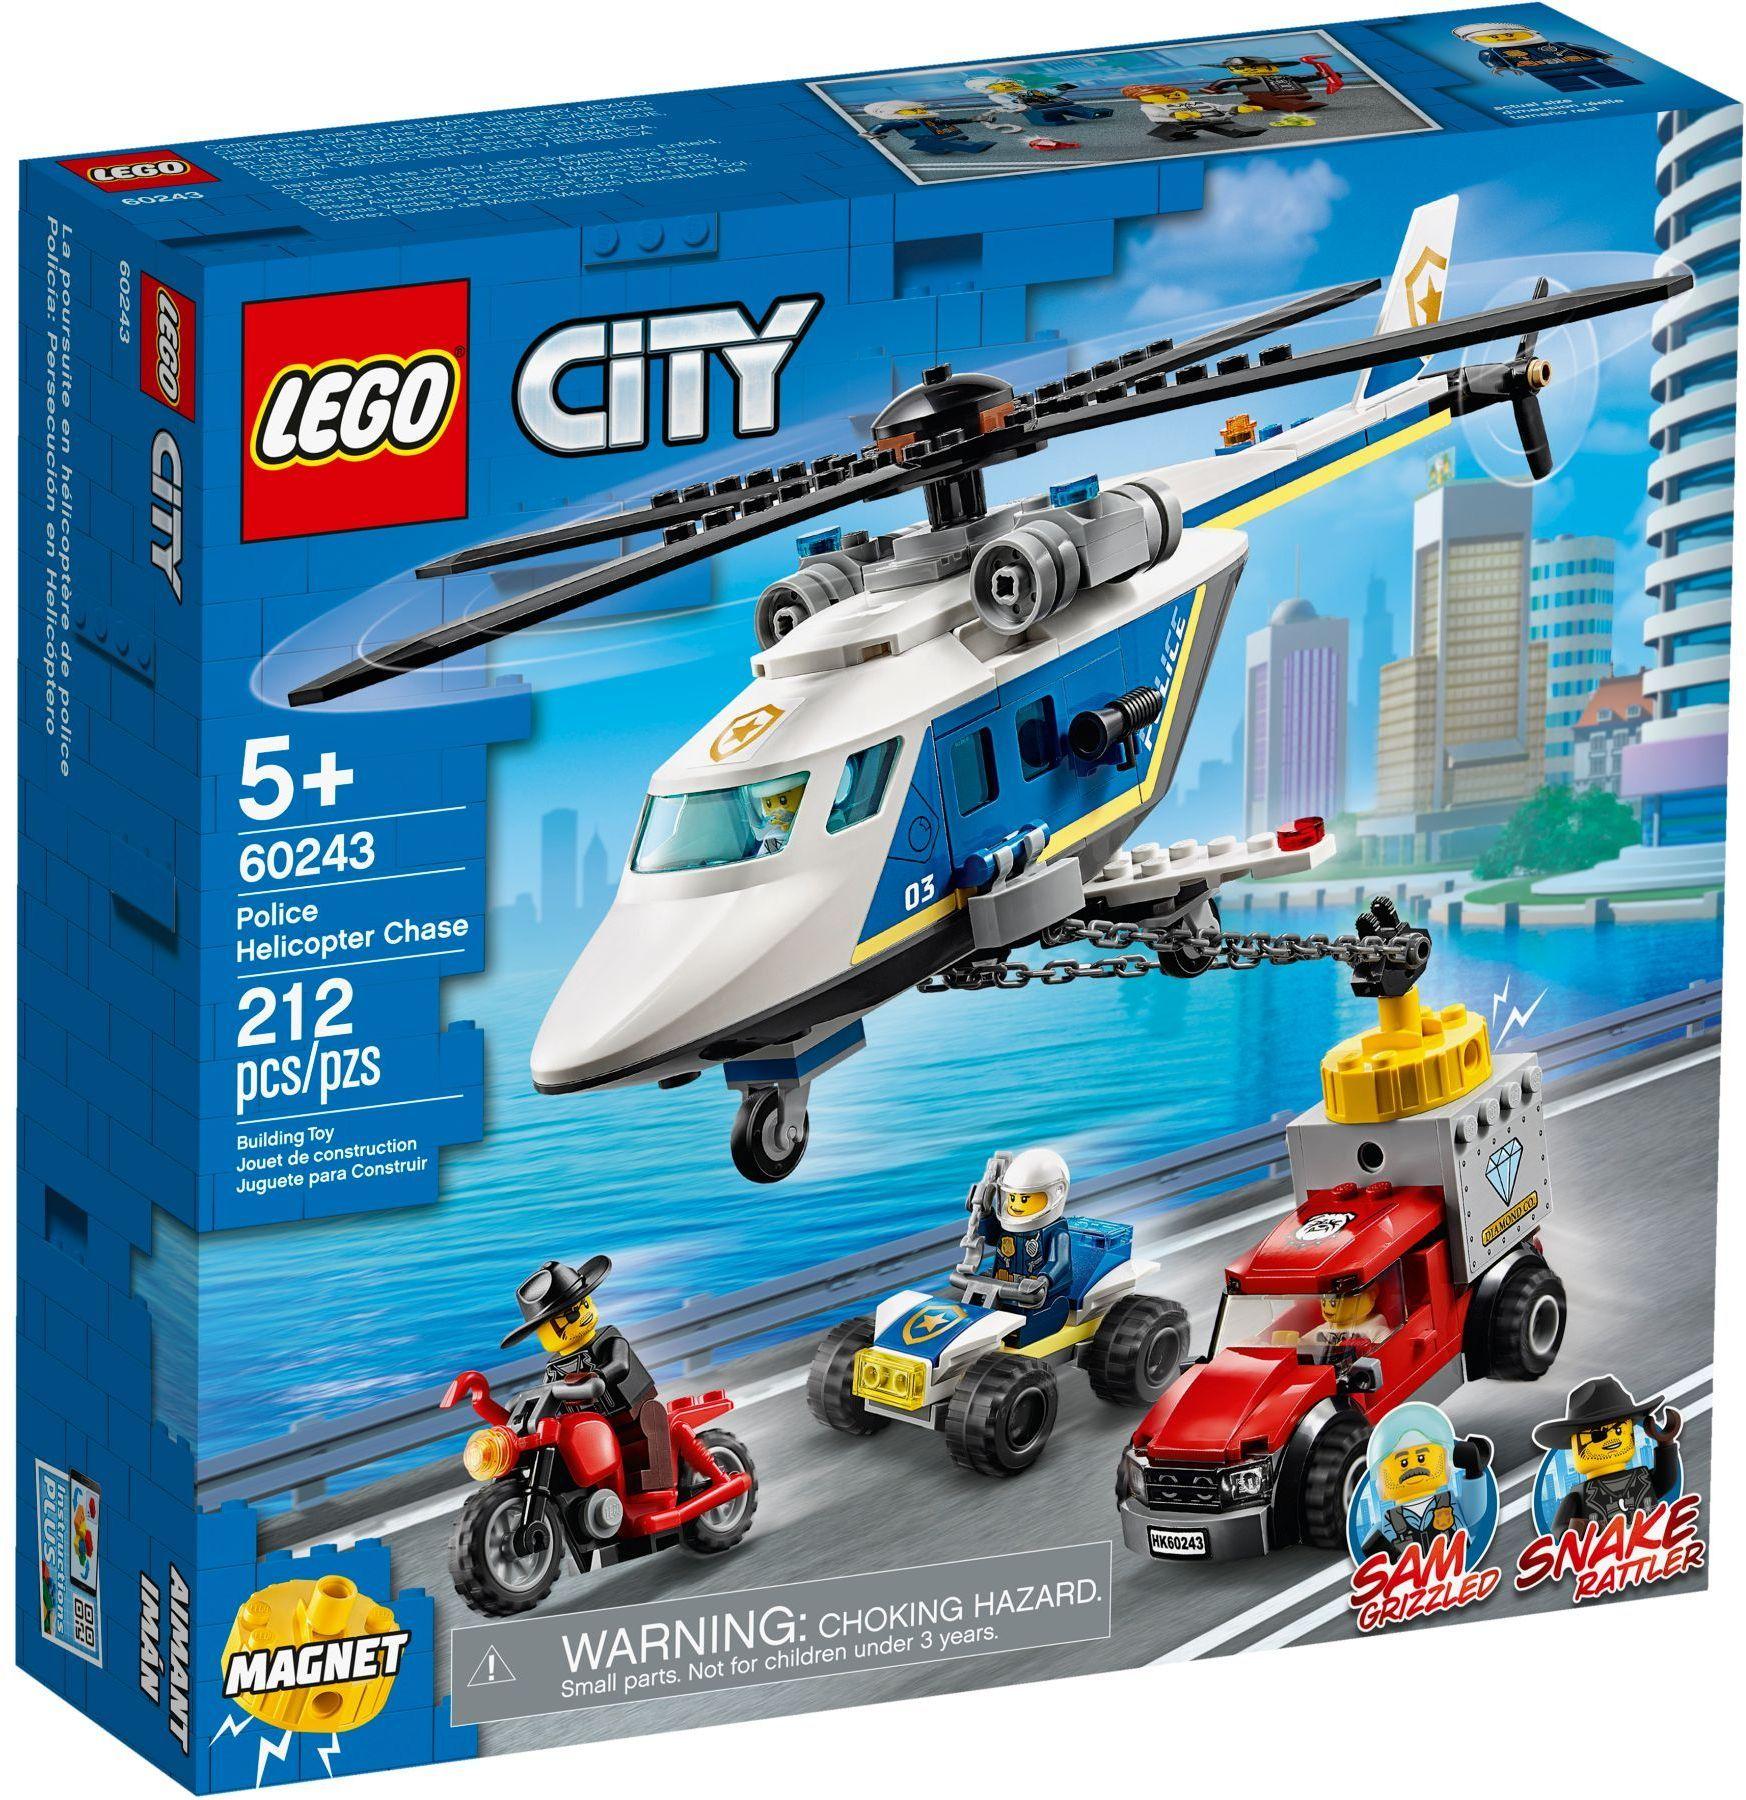 Lego City 60243 Police Helicopter Chase Lego City Lego City Police Lego City Sets